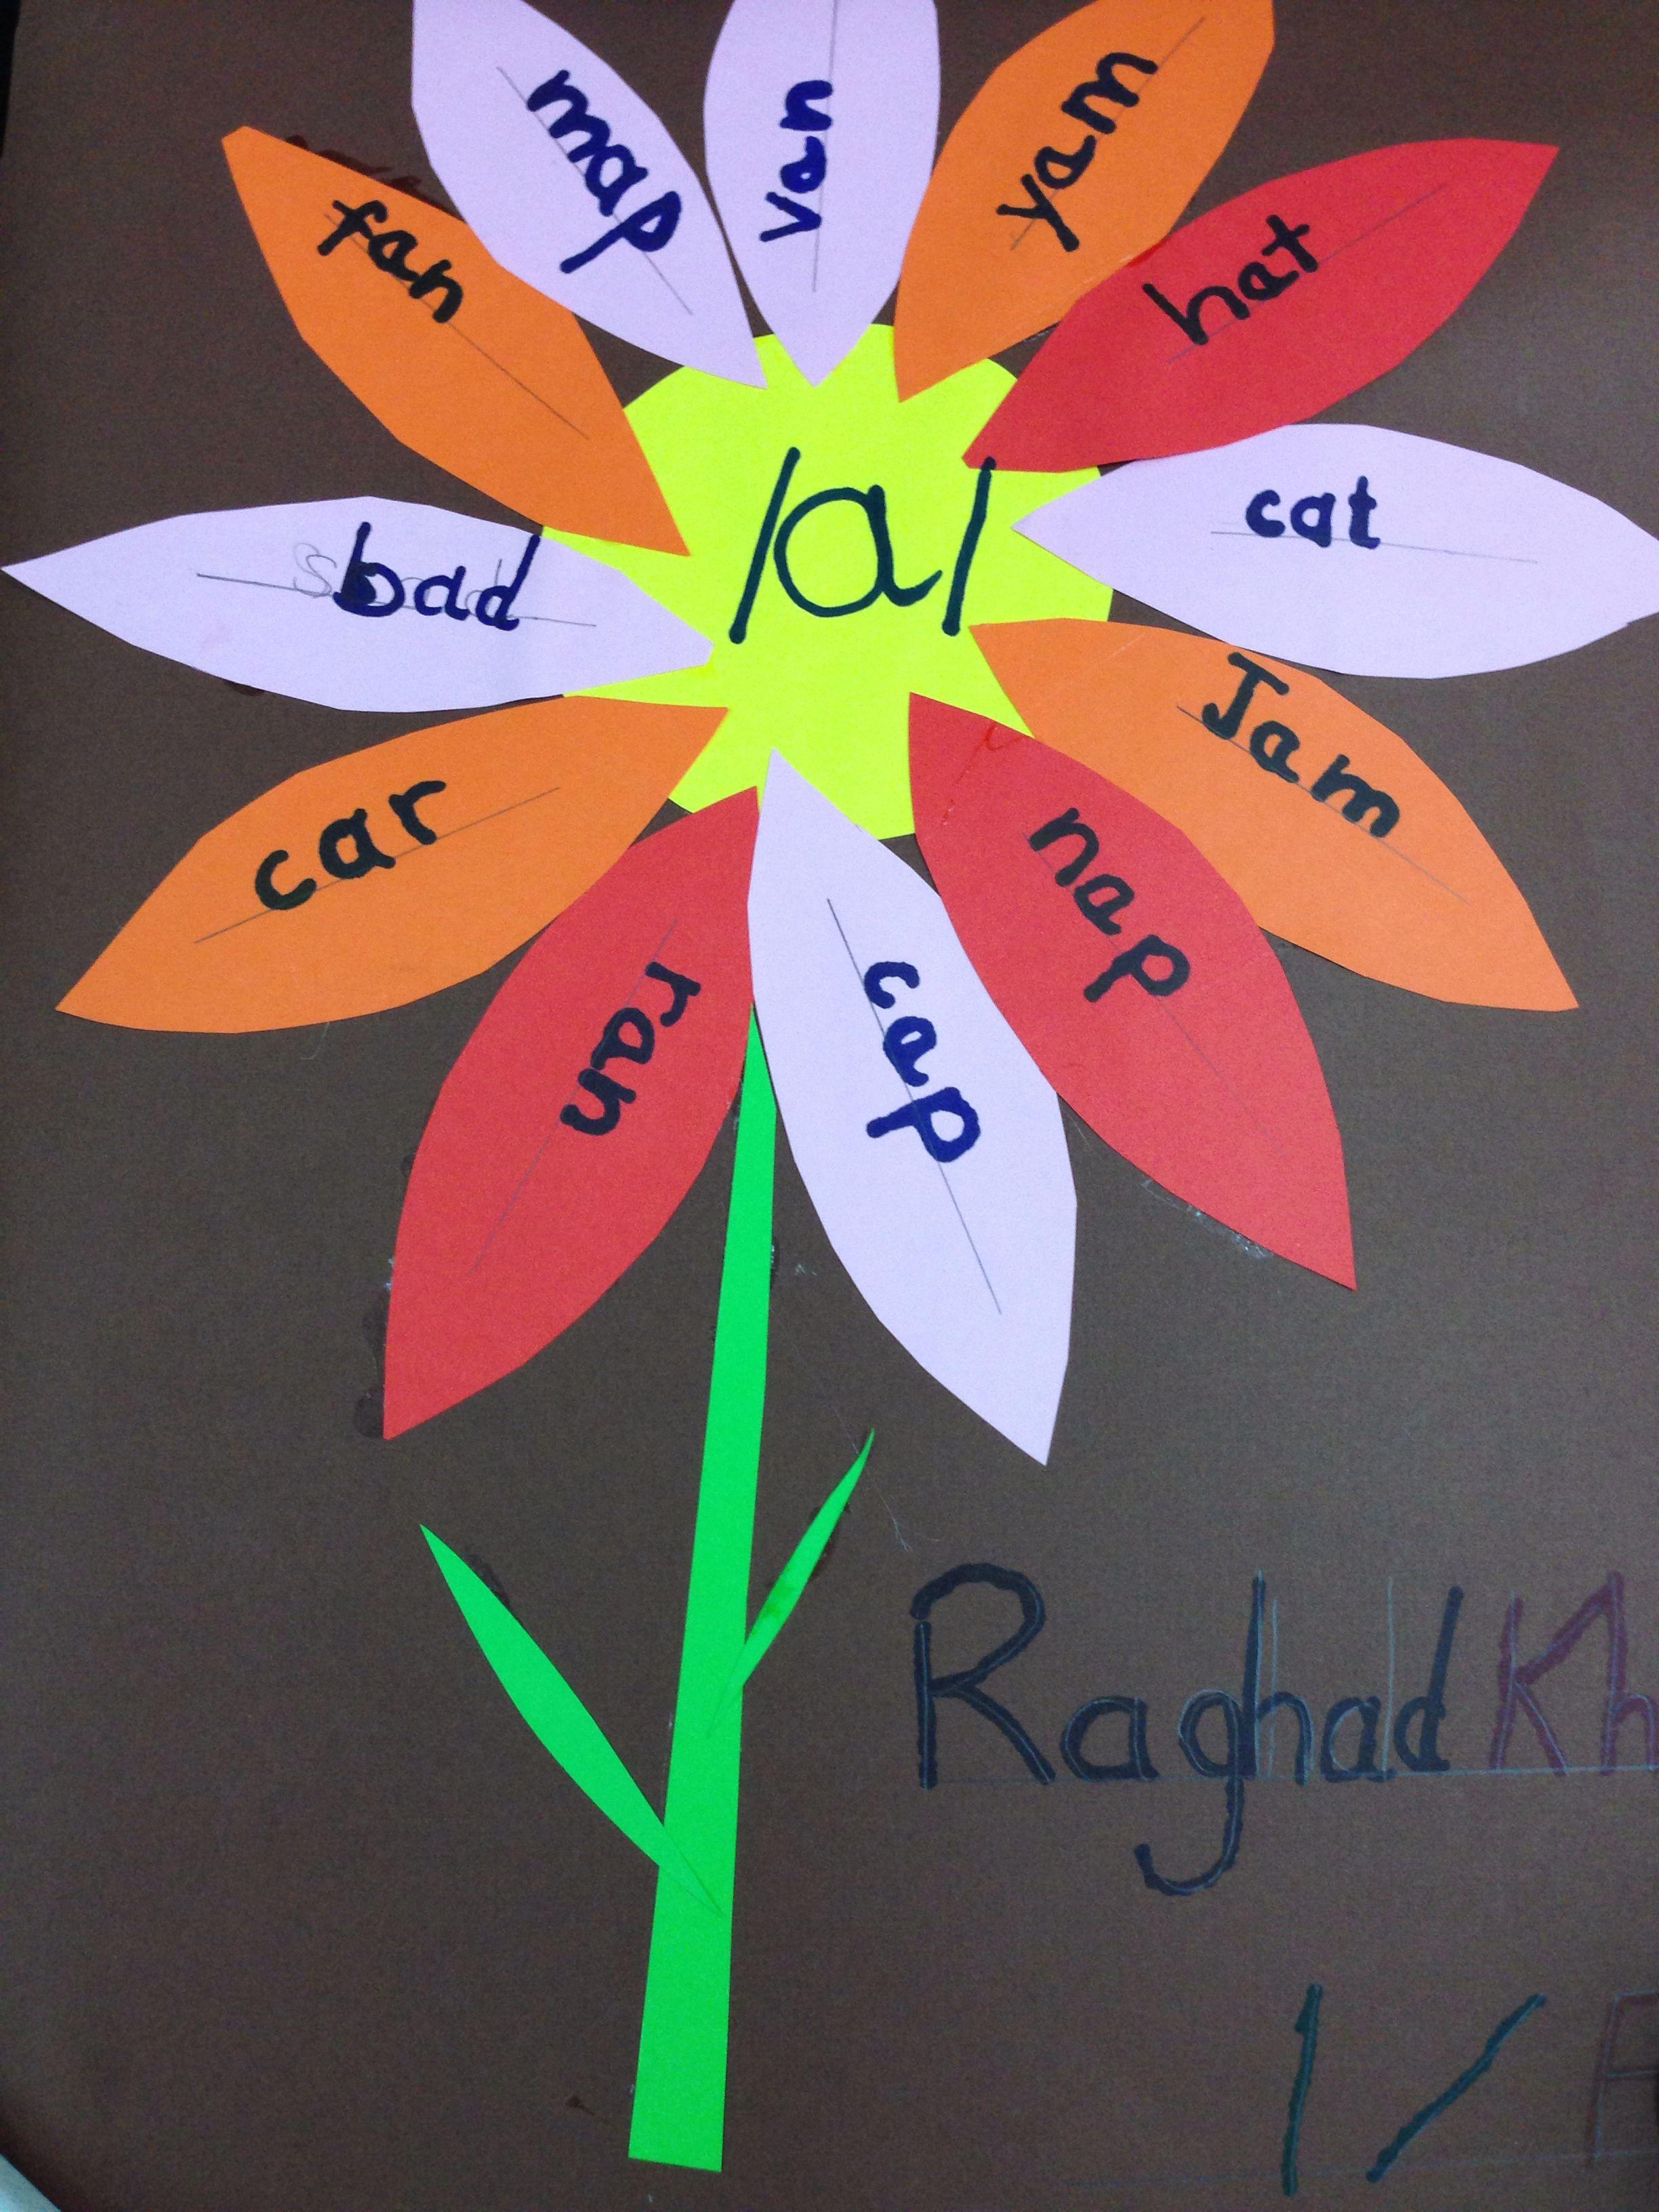 Short A Sound Words Flower Grade 1